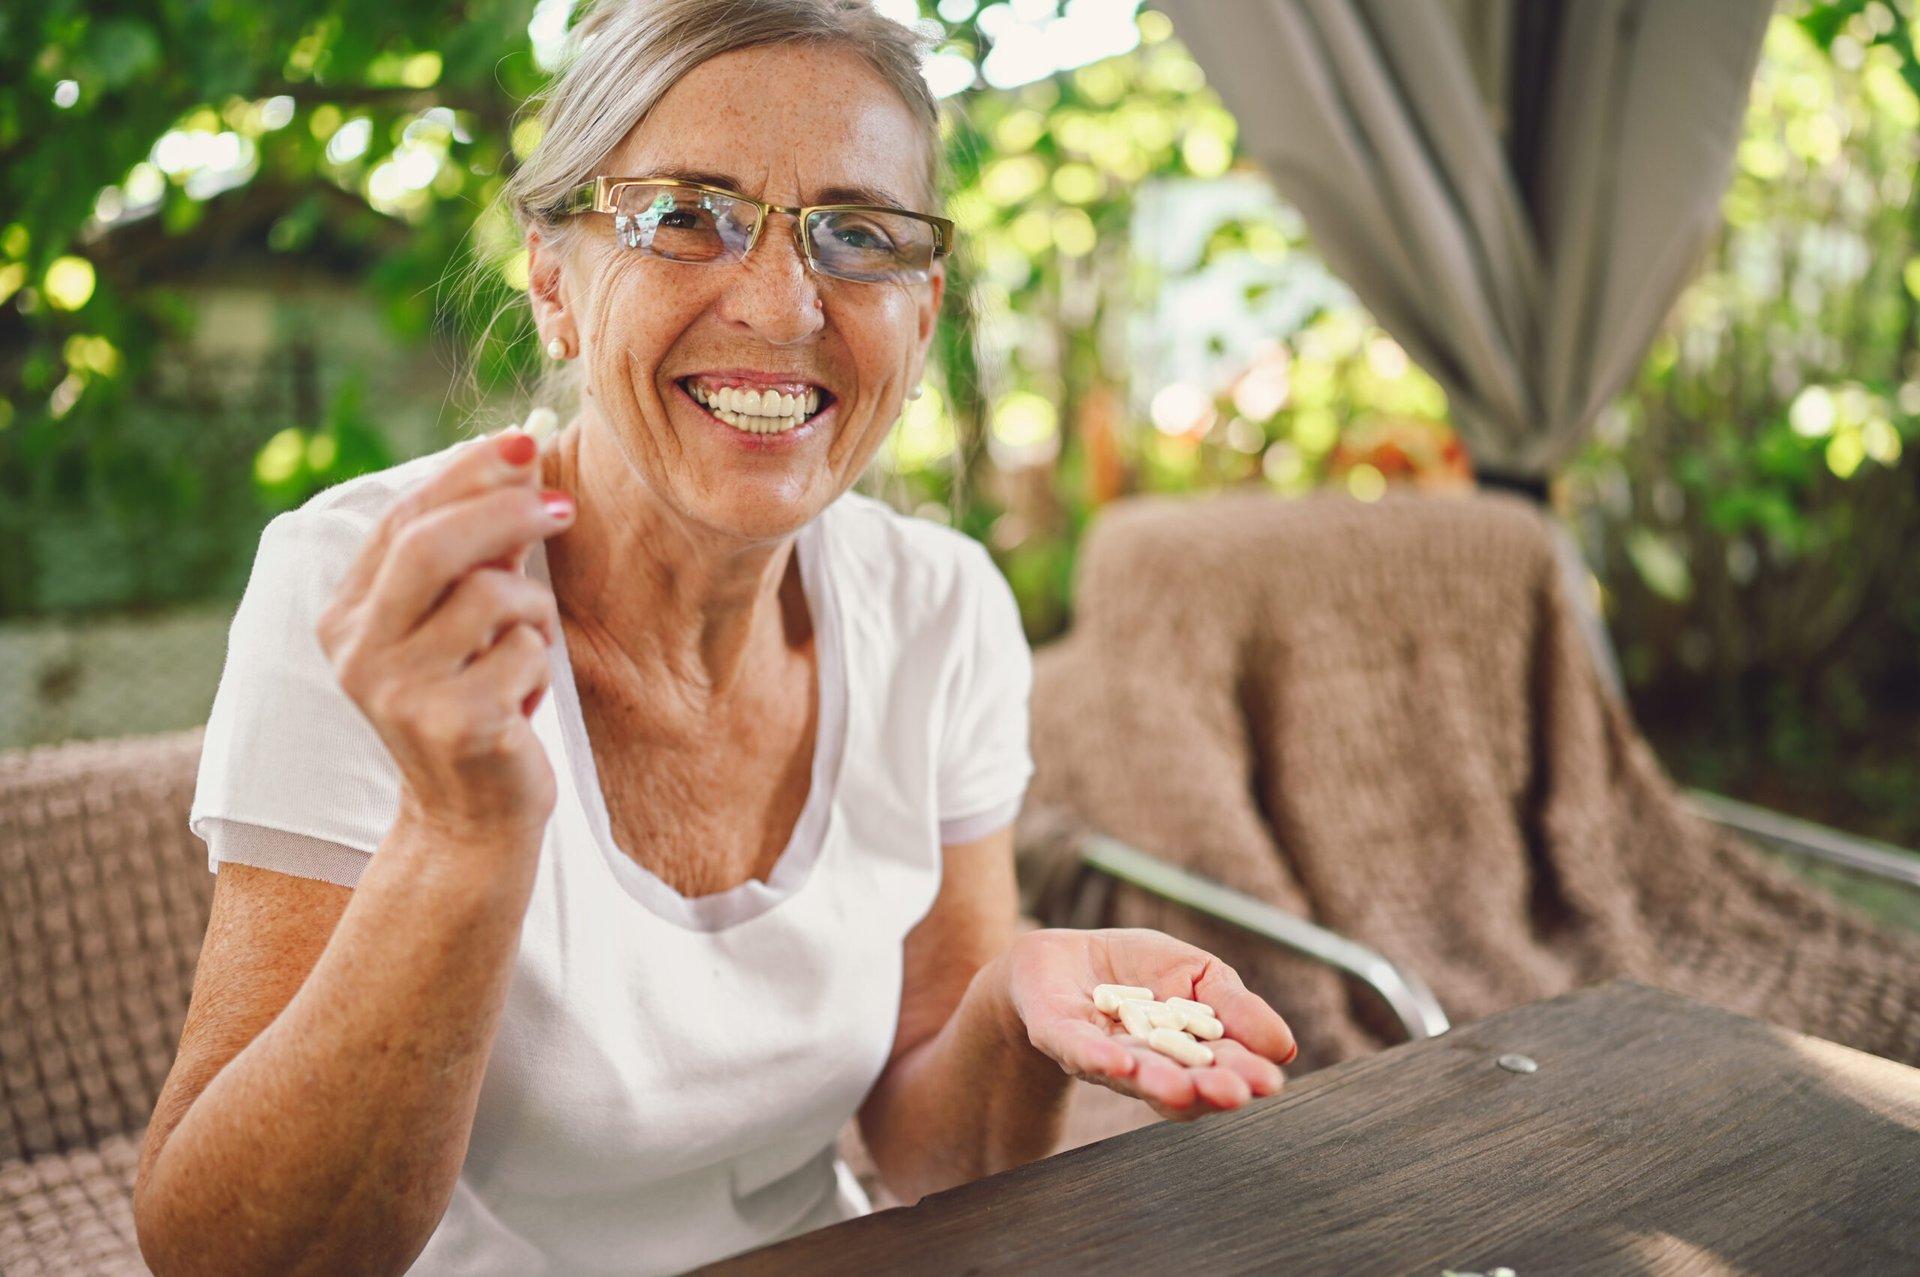 Elderly woman with prescription drugs